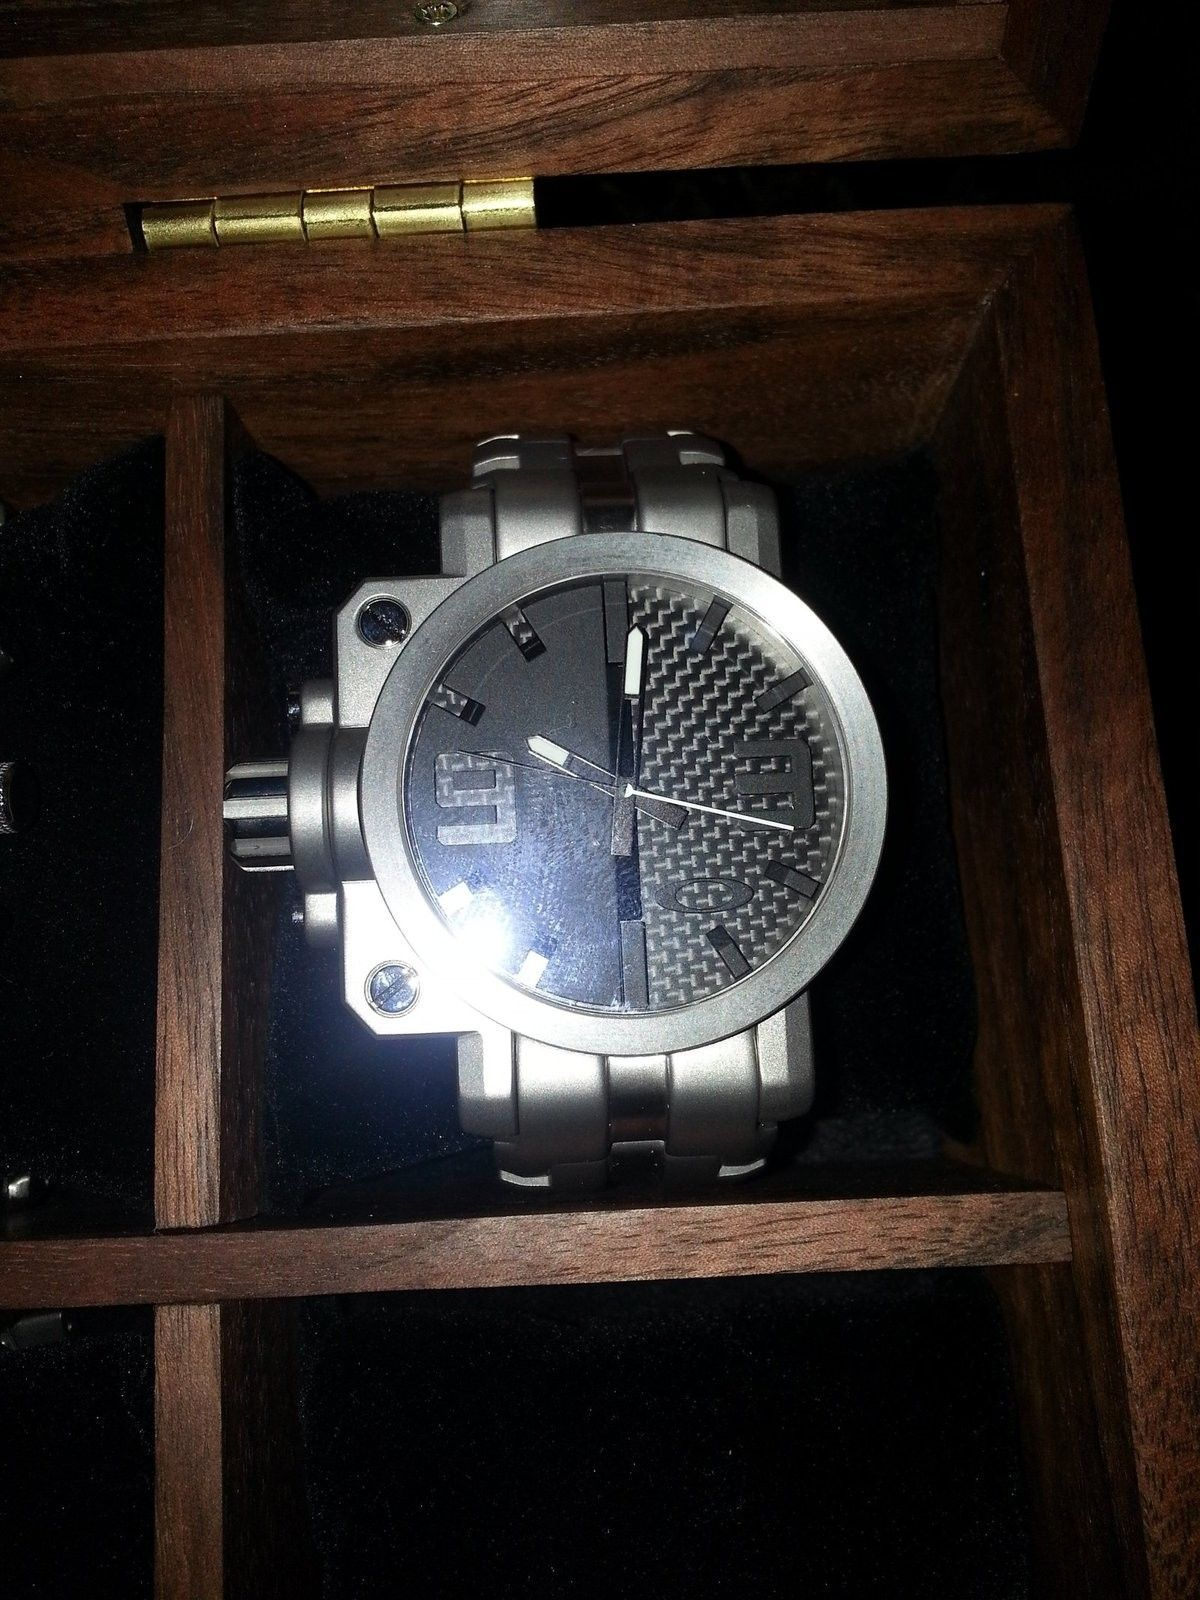 Got a new watch box.....collection growing - 20151201_220231.jpg